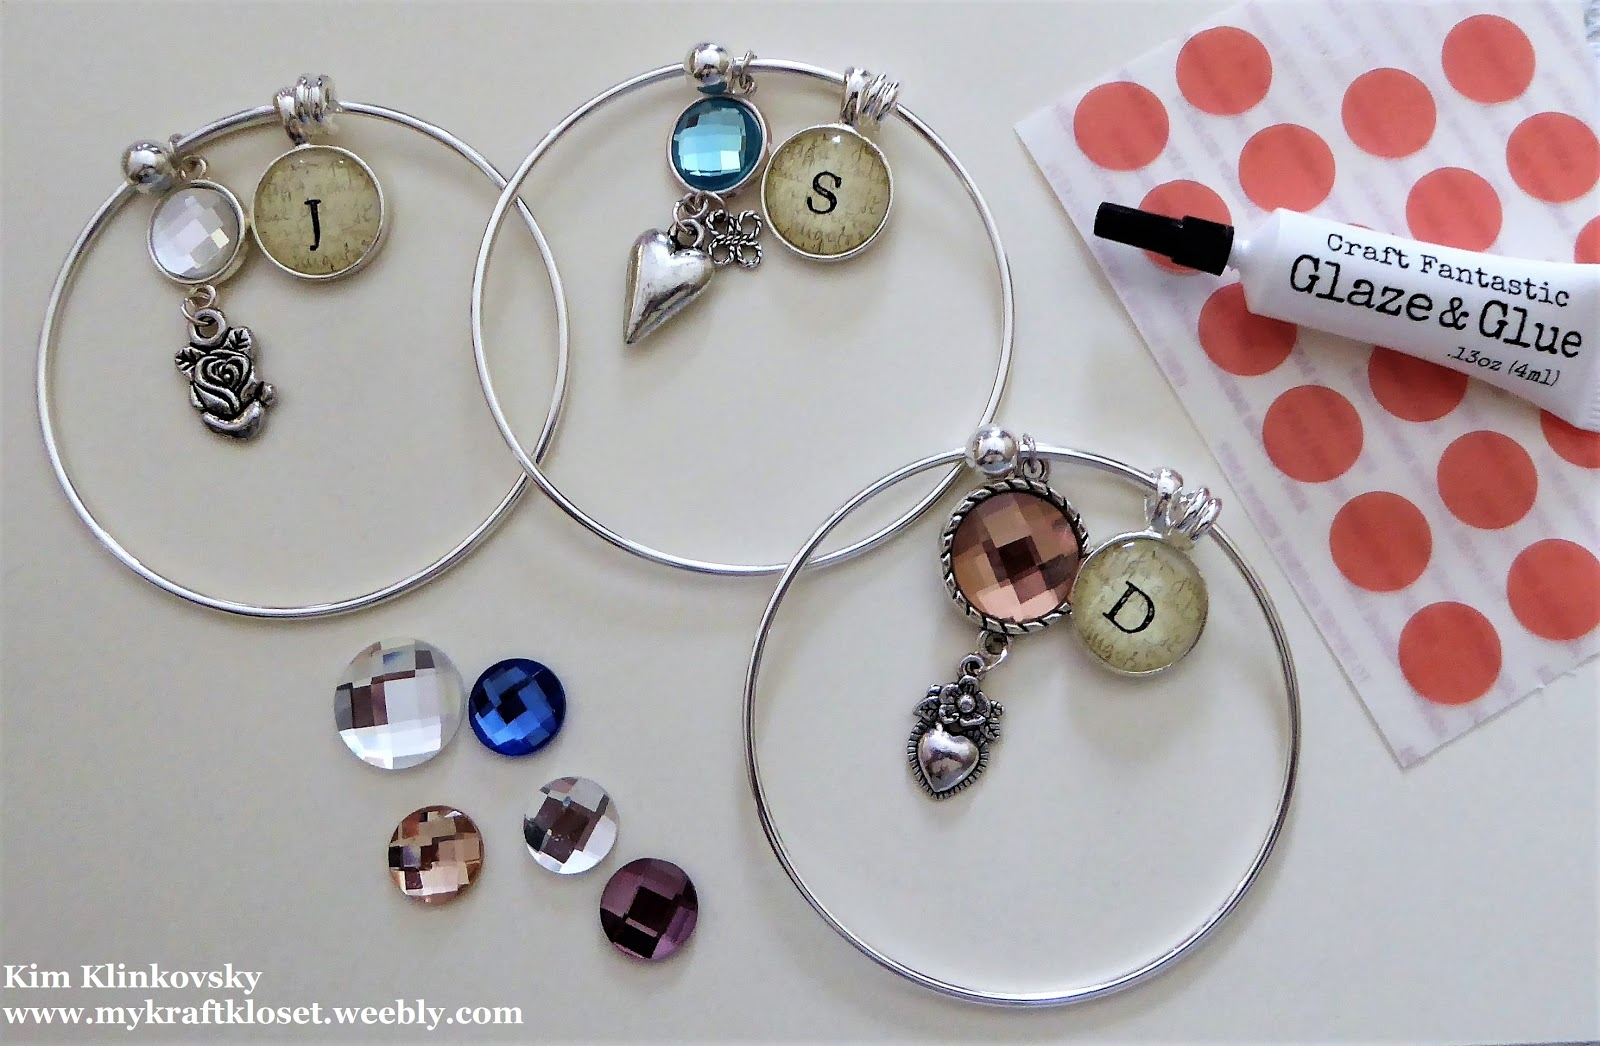 Craft Fantastic Blog Bridal Party Wedding Gifts